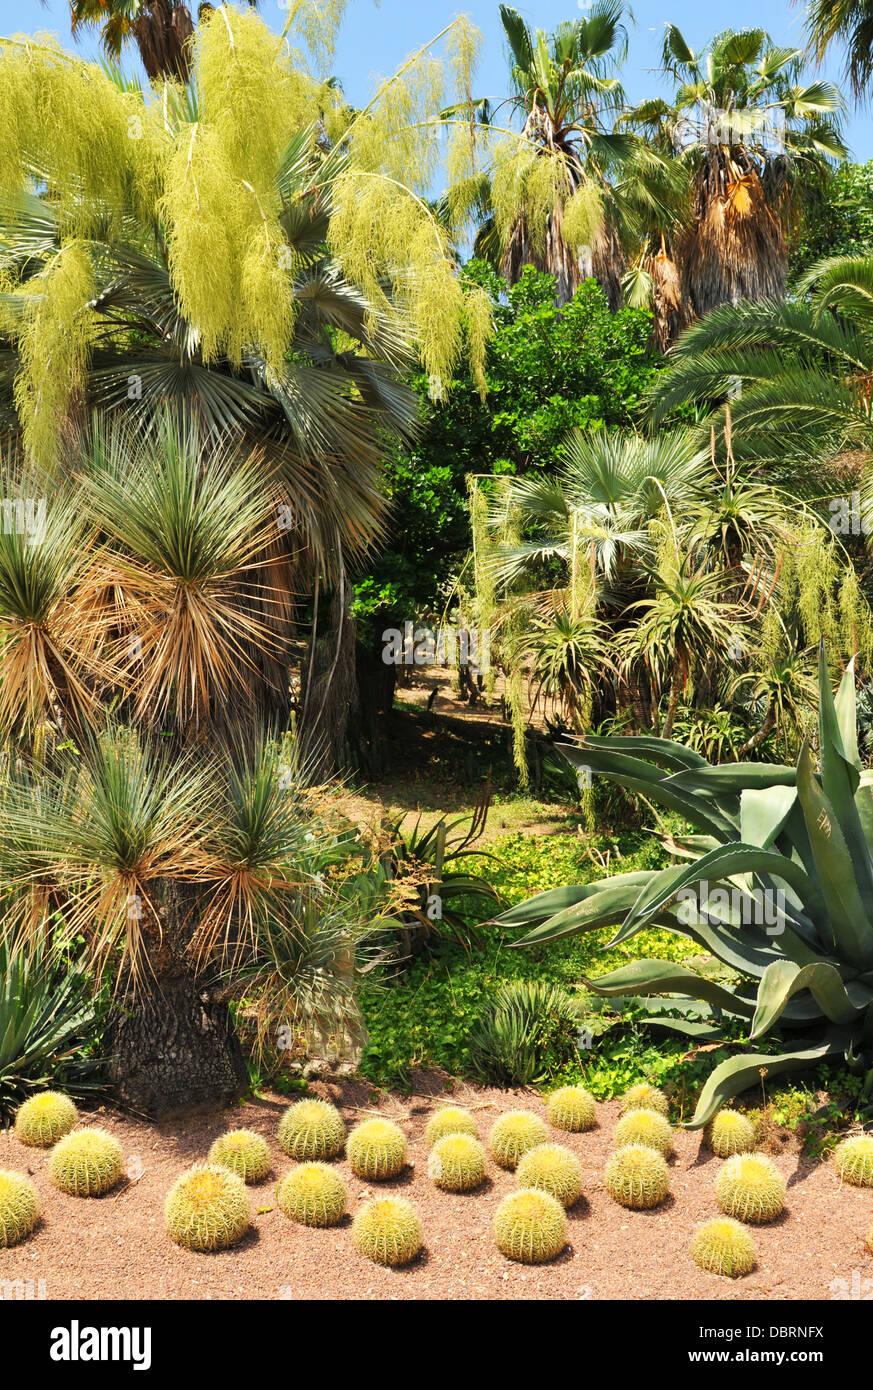 Botanischer Garten In Barcelona Spanien Stockfoto Bild 58914126